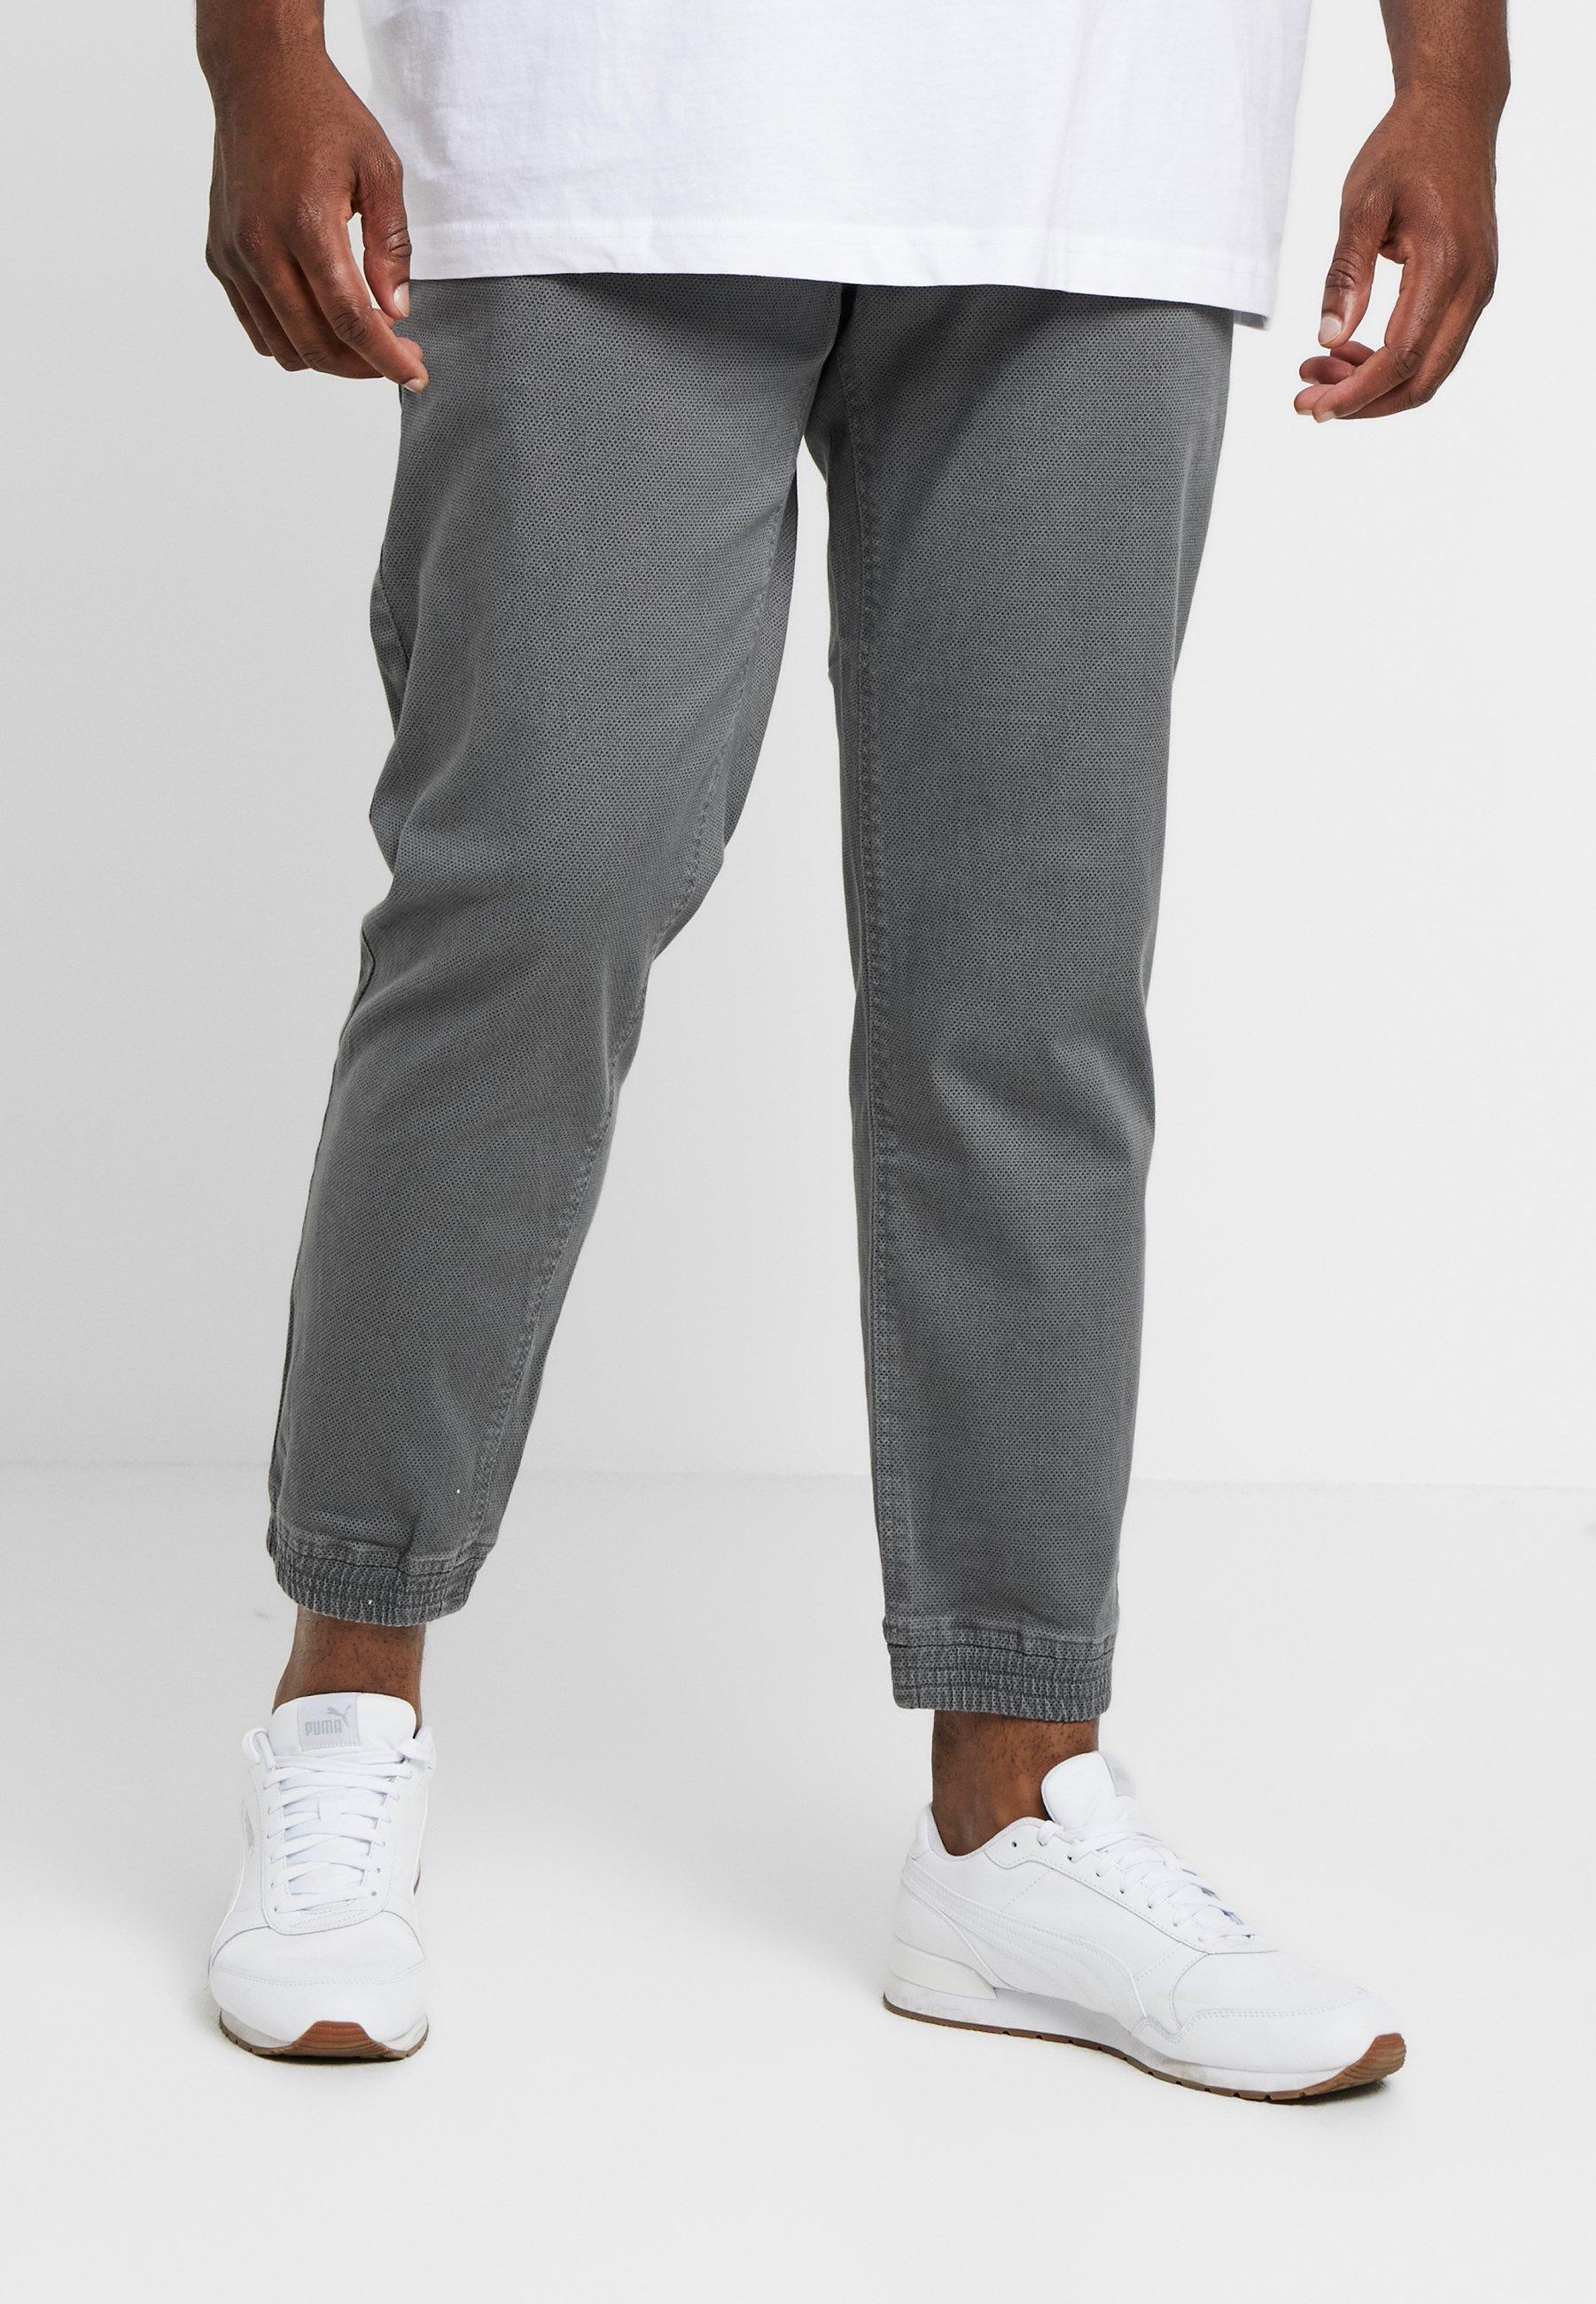 Pantalon Blend Pantalon ClassiqueGranite Blend Pantalon ClassiqueGranite Blend ClassiqueGranite Pantalon ClassiqueGranite Blend zMLVpqSUG